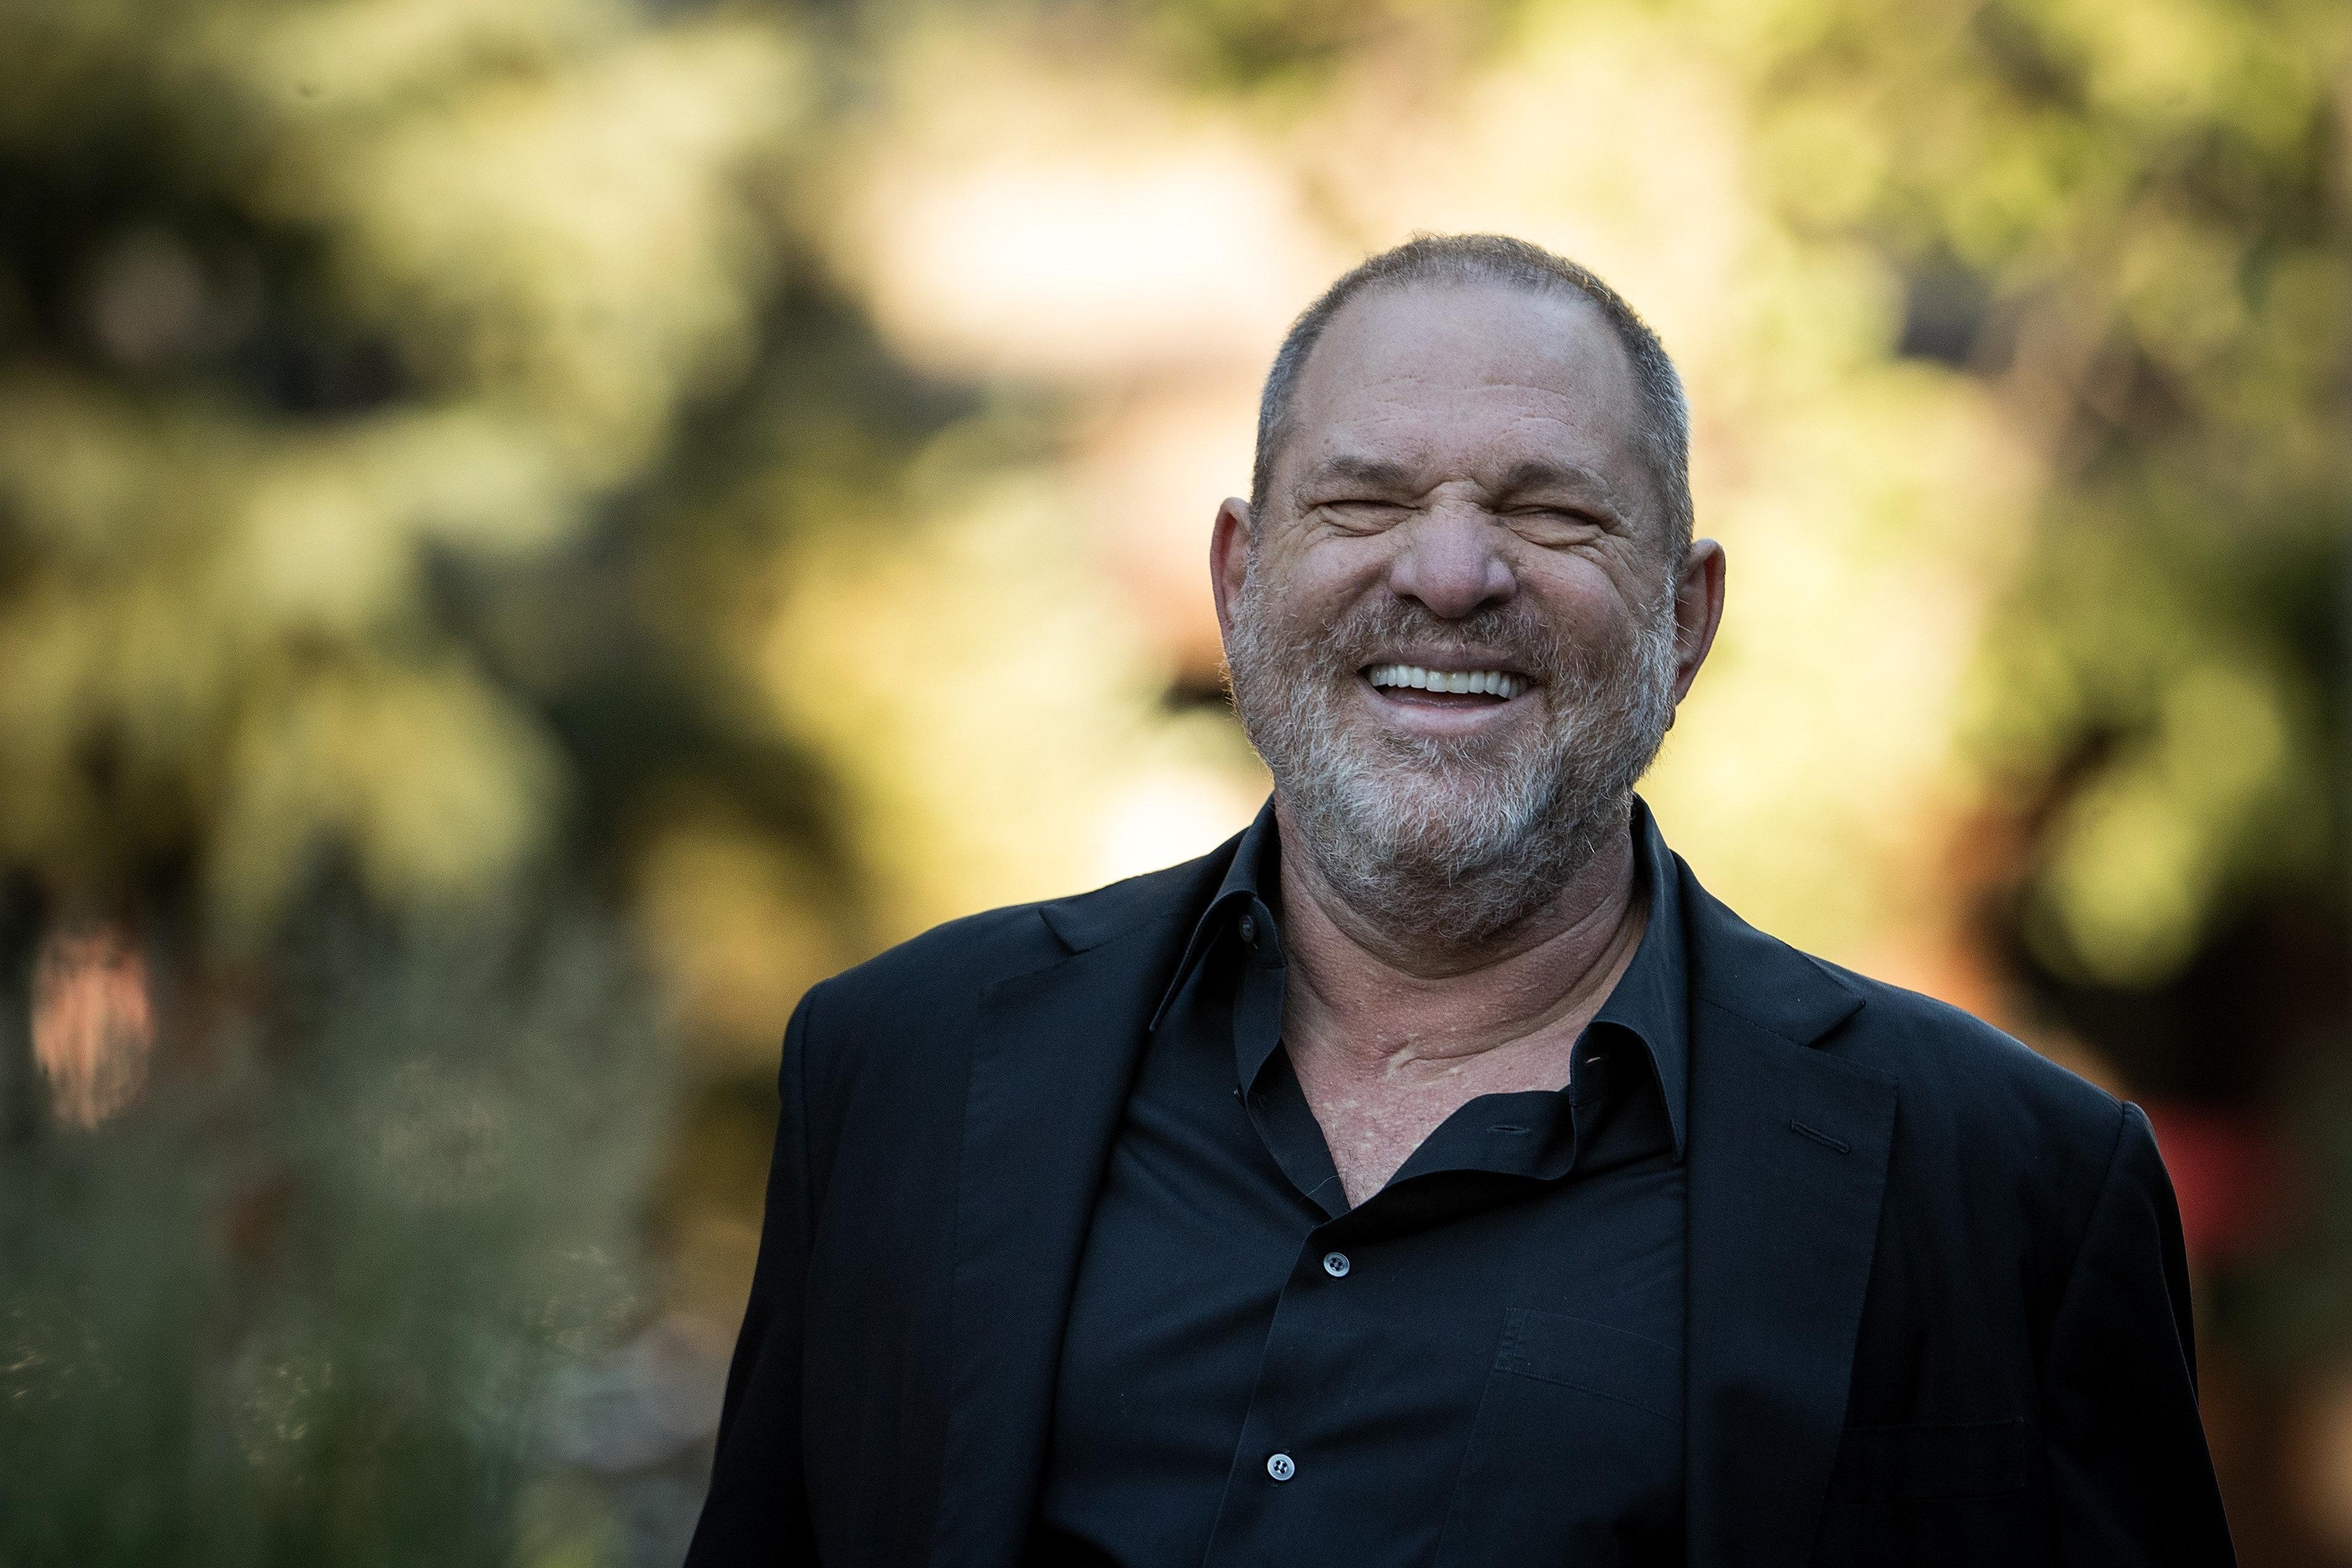 Tρεις μηνυτήριες αναφορές σε βάρος του Harvey Weinstein στα χέρια της